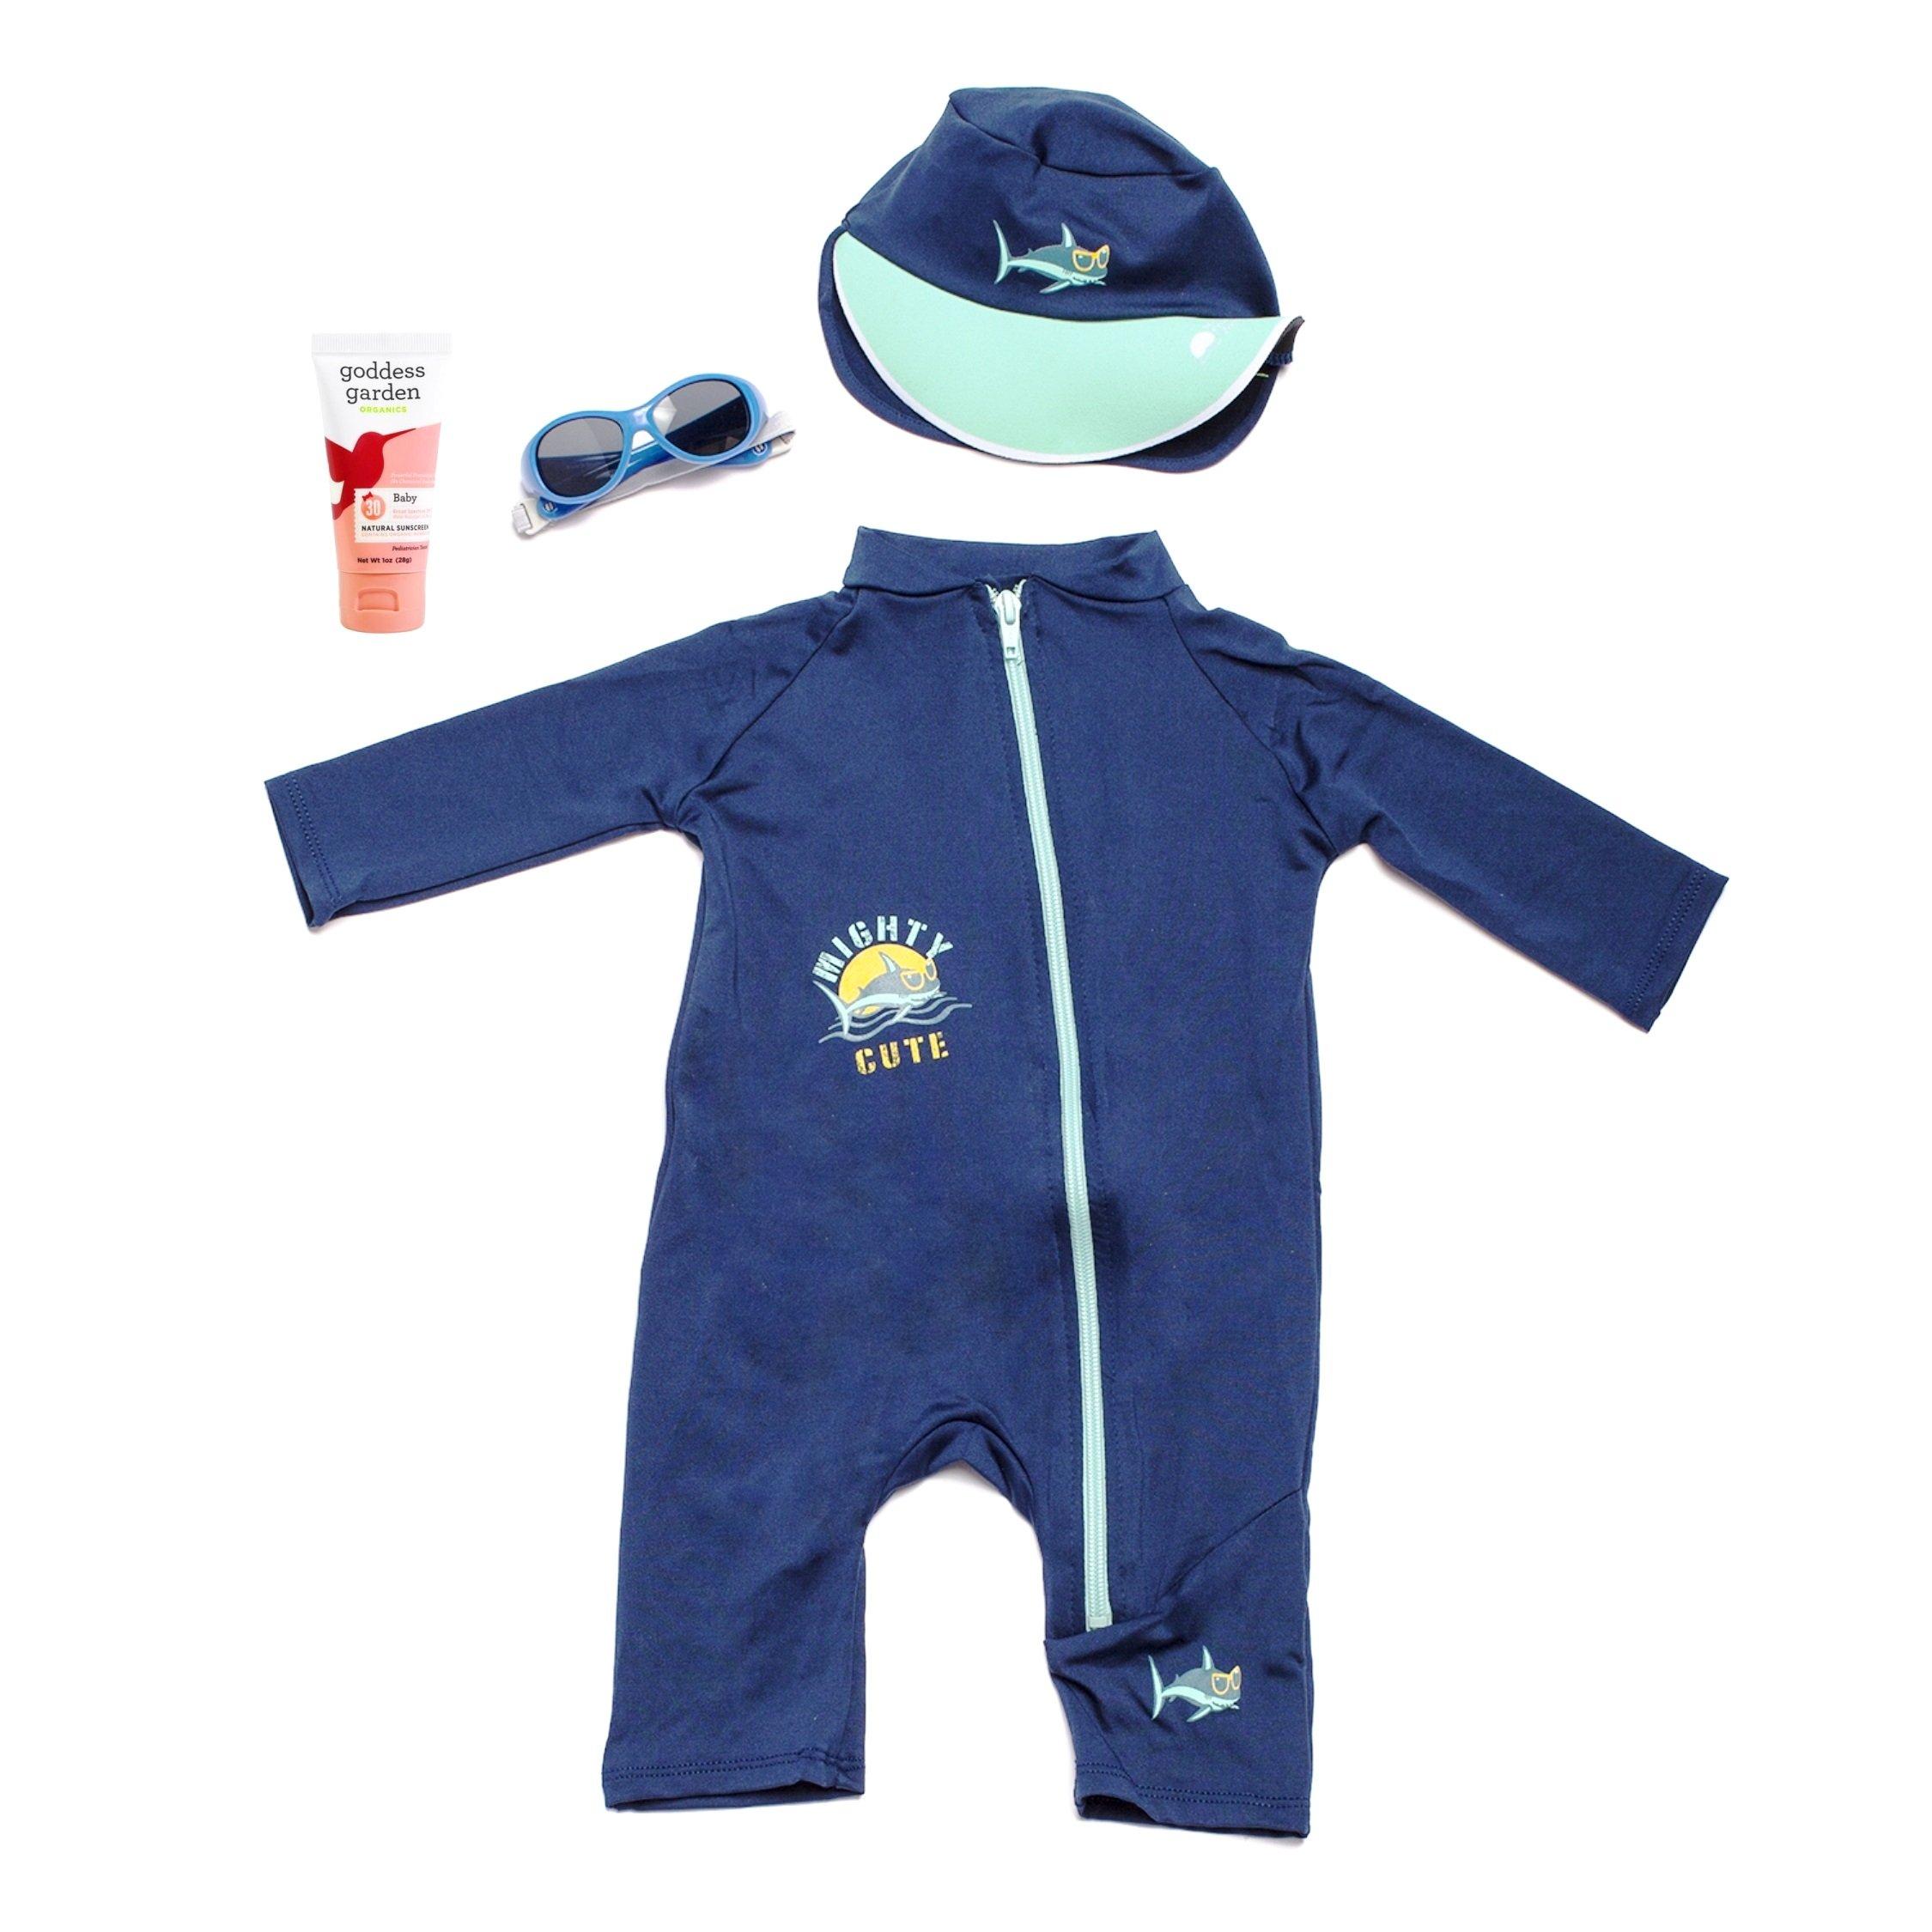 Baby's First Sun Day Infant Toddler Long Sleeve Sunsuit, Sun Cap, Sun Glasses and Goddess Garden Organics Sunscreen Kit (18 to 24 Months, Navy)